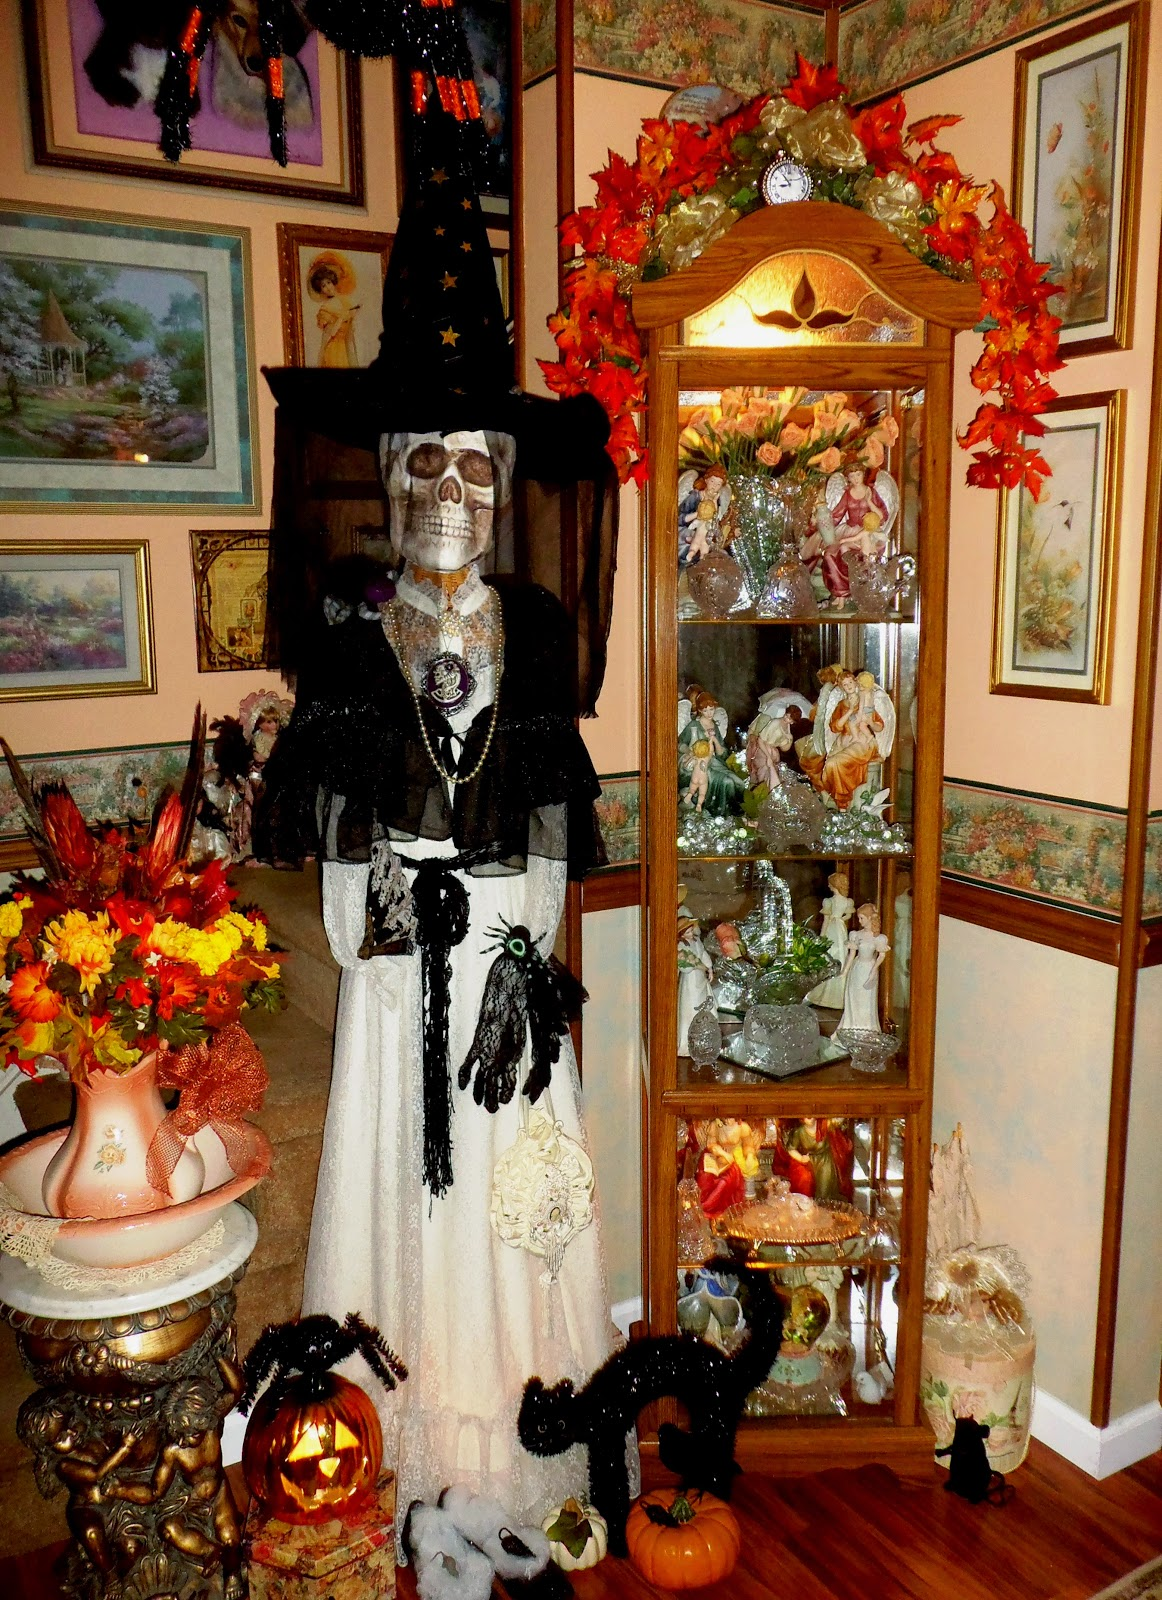 20 Stunning Halloween Room Decorations Ideas - Decoration Love on Decor Room  id=35870